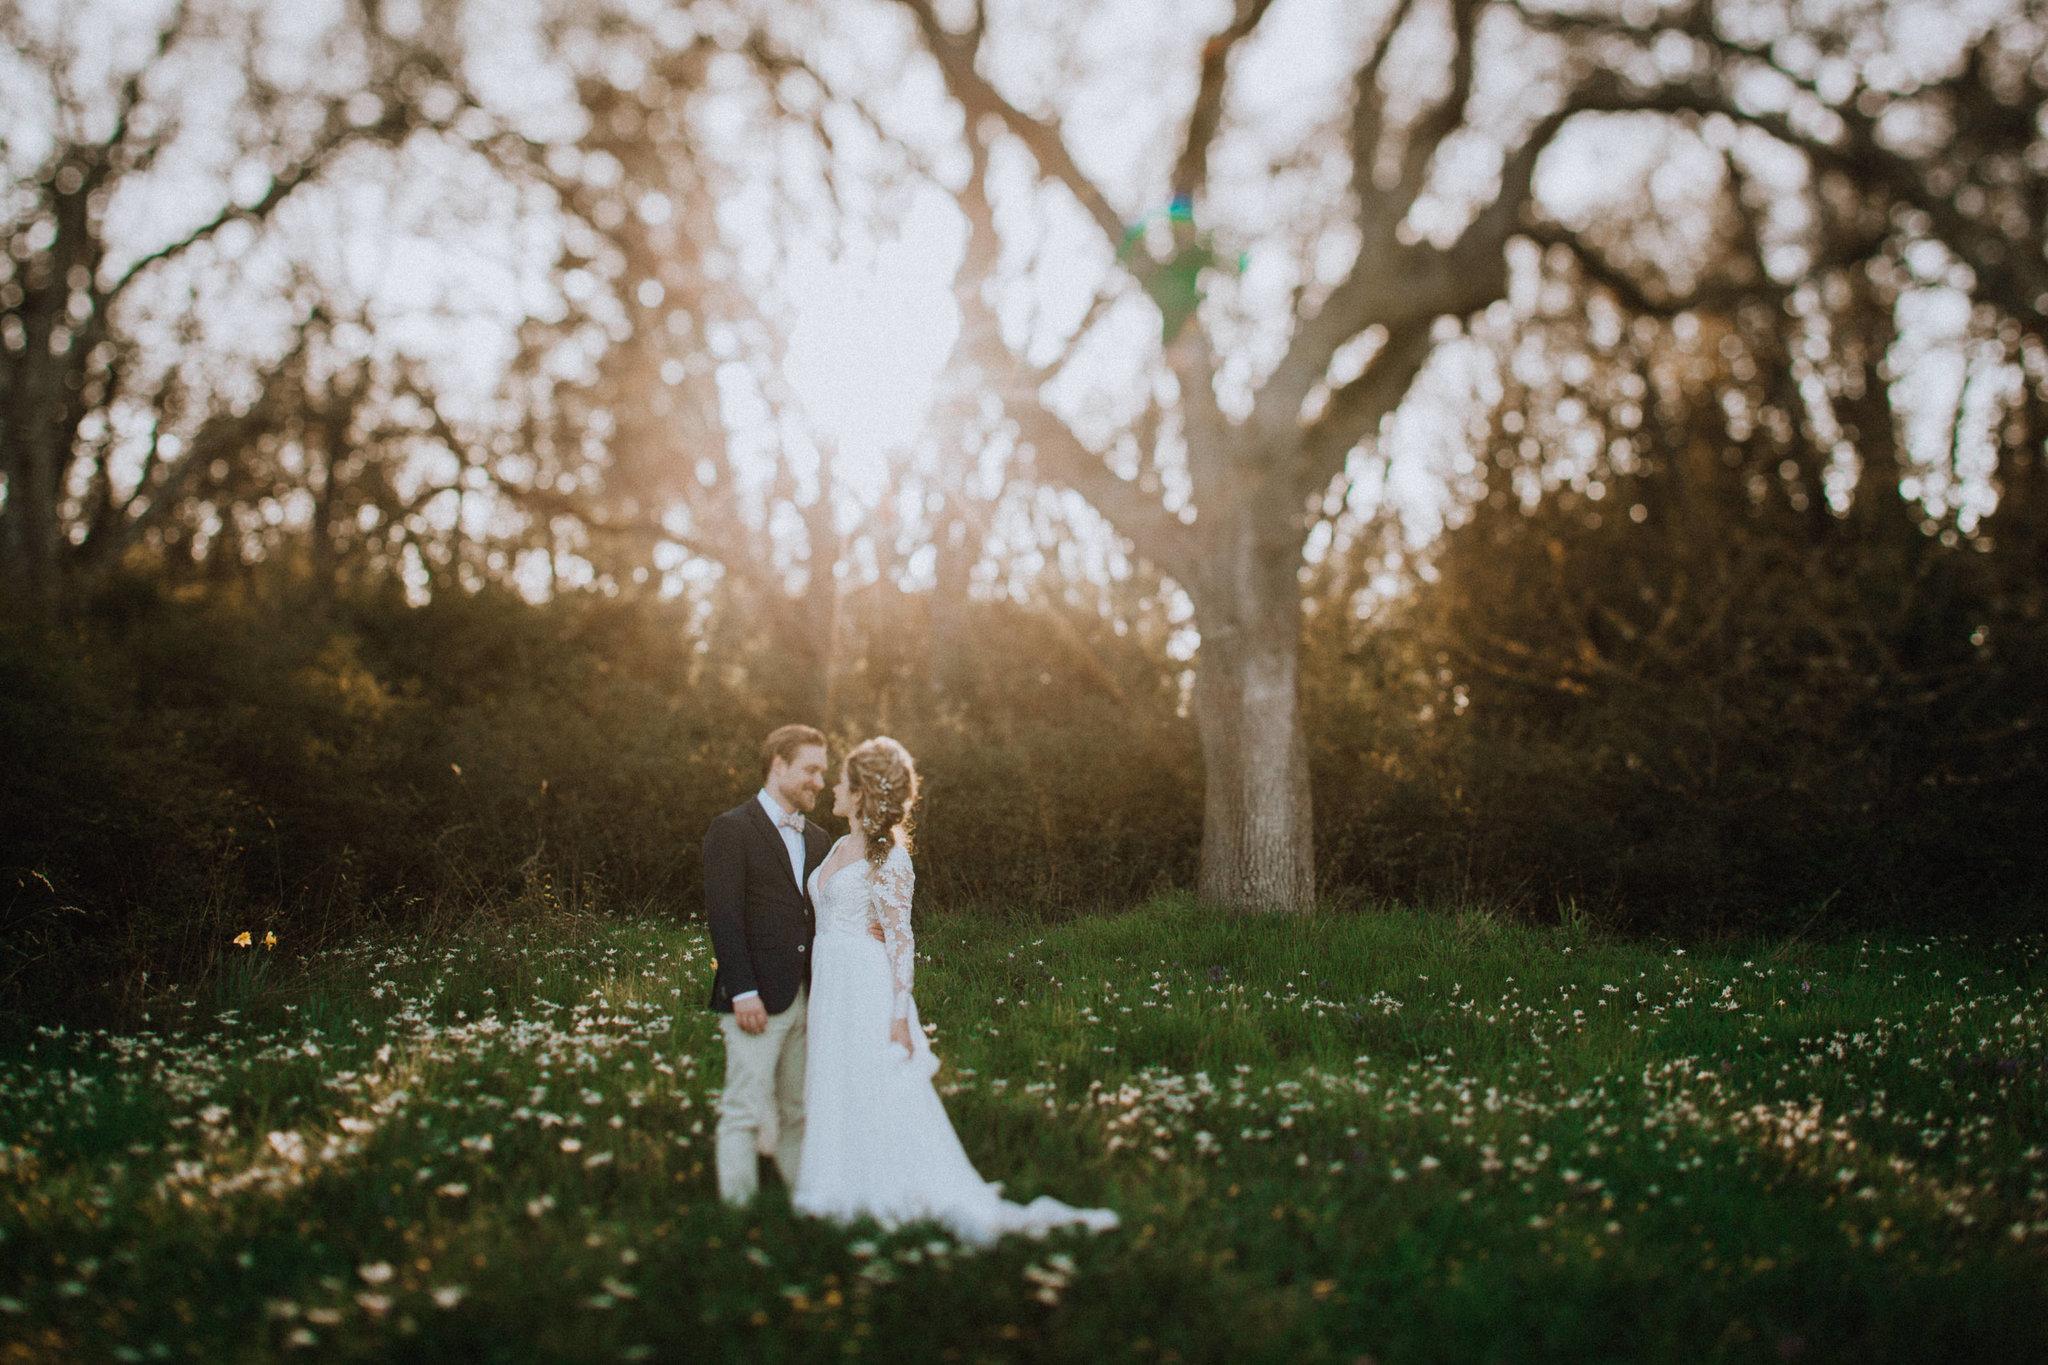 Beach Bridal Session Sunshine through trees Outlooks for Men BC Wedding Magazine